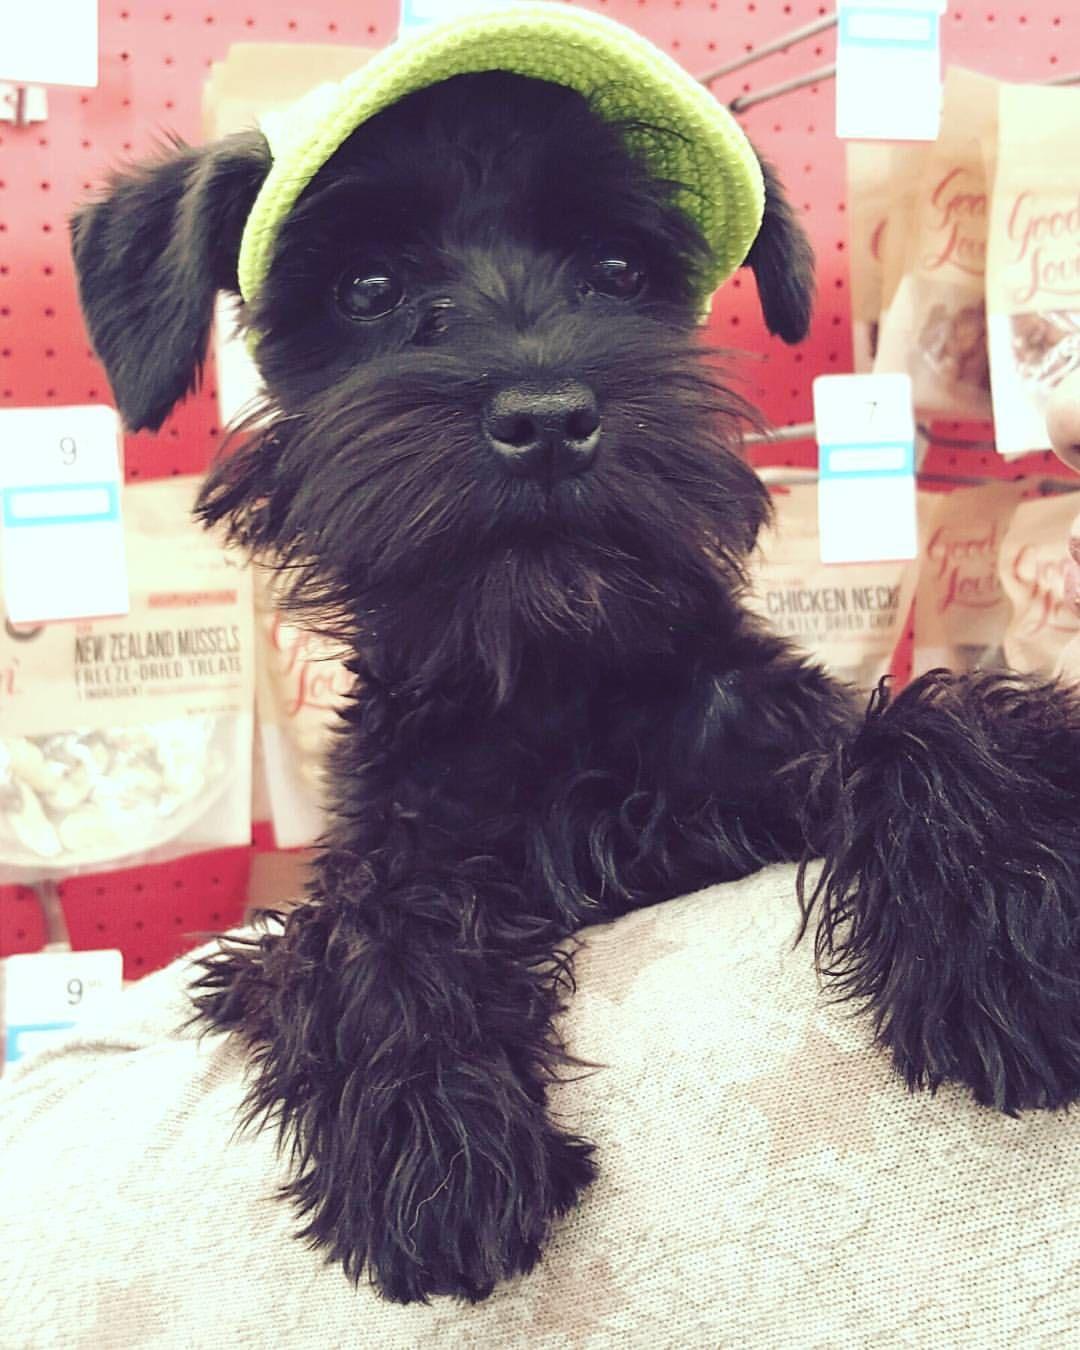 29 Likes 5 Comments Little Susy Susy Mini Schnauzer On Instagram Ready Sun Littleschnauzer Susylittleschn Schnauzer Black Schnauzer Schnauzer Puppy